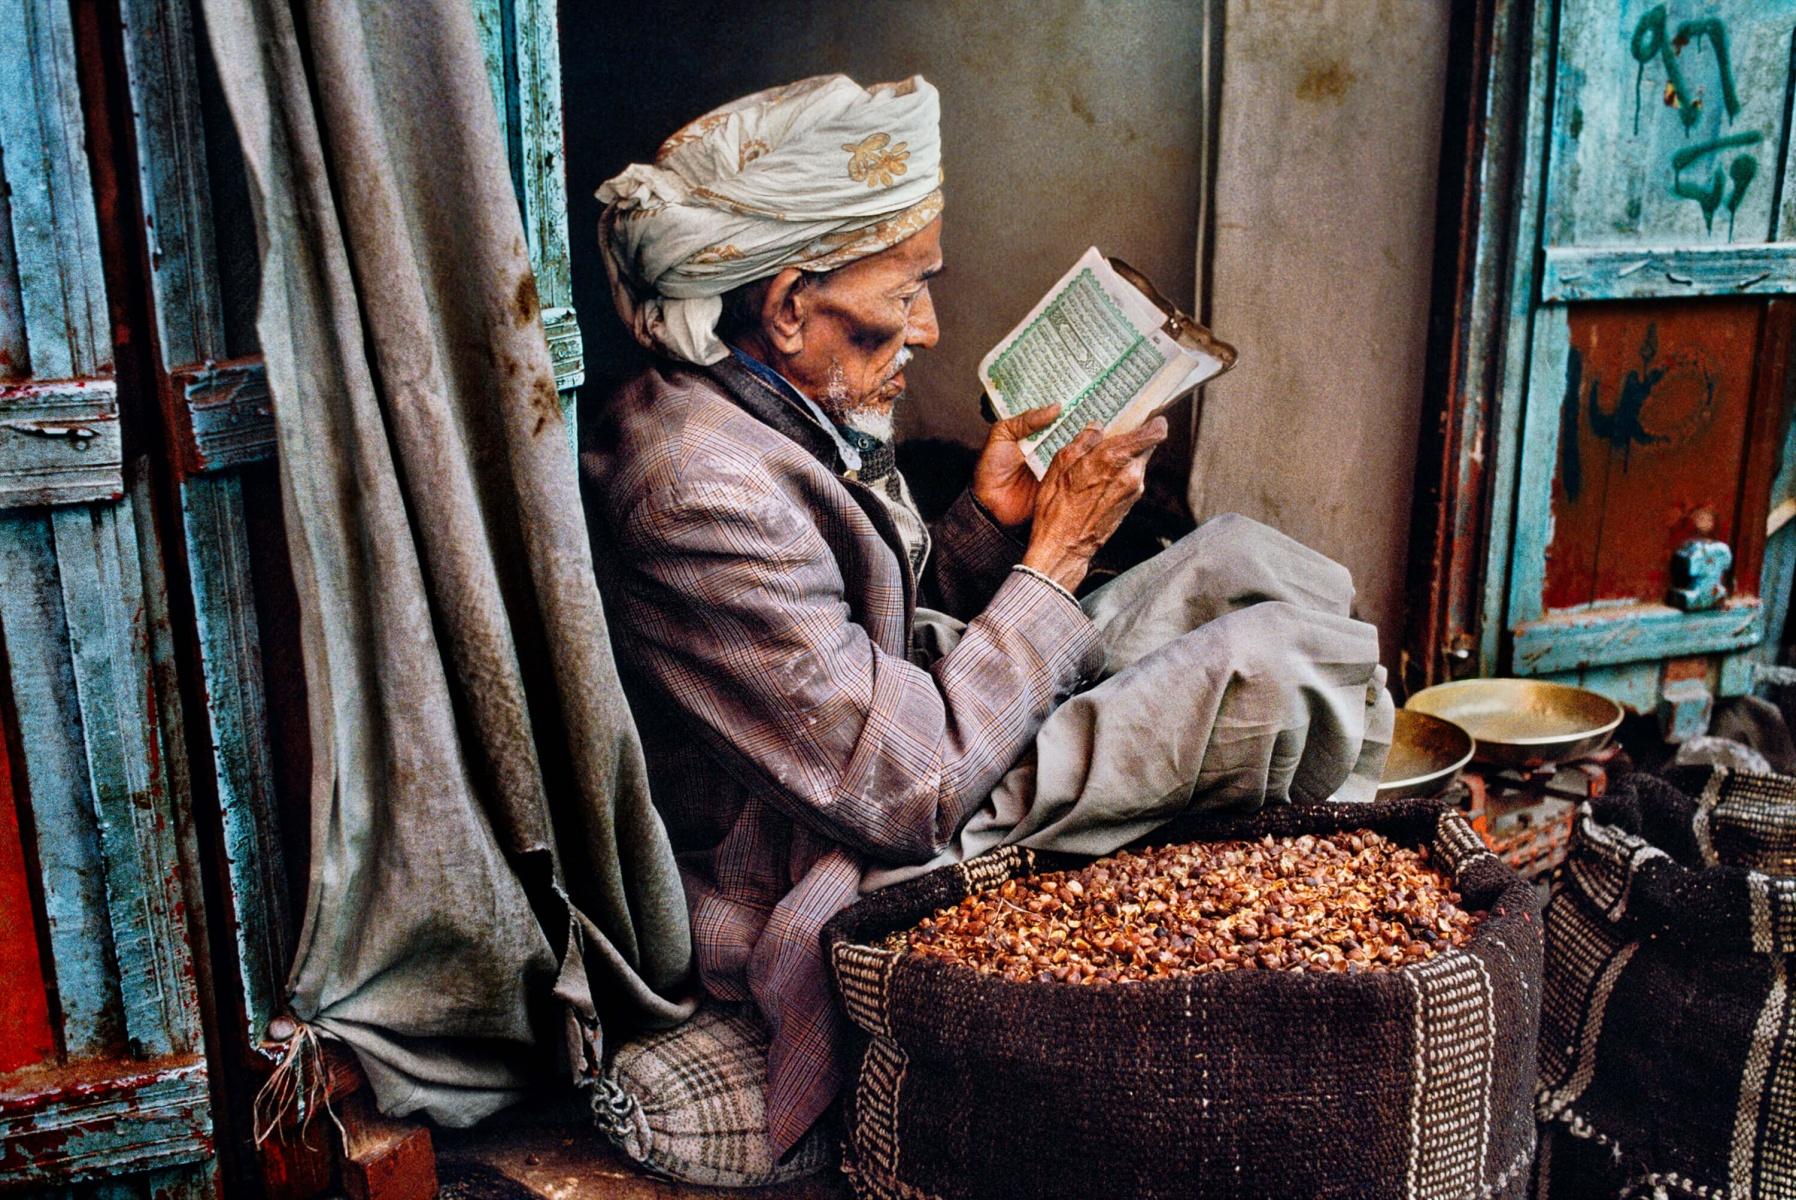 Sana'a, Yemen, 1997 © Steve McCurry